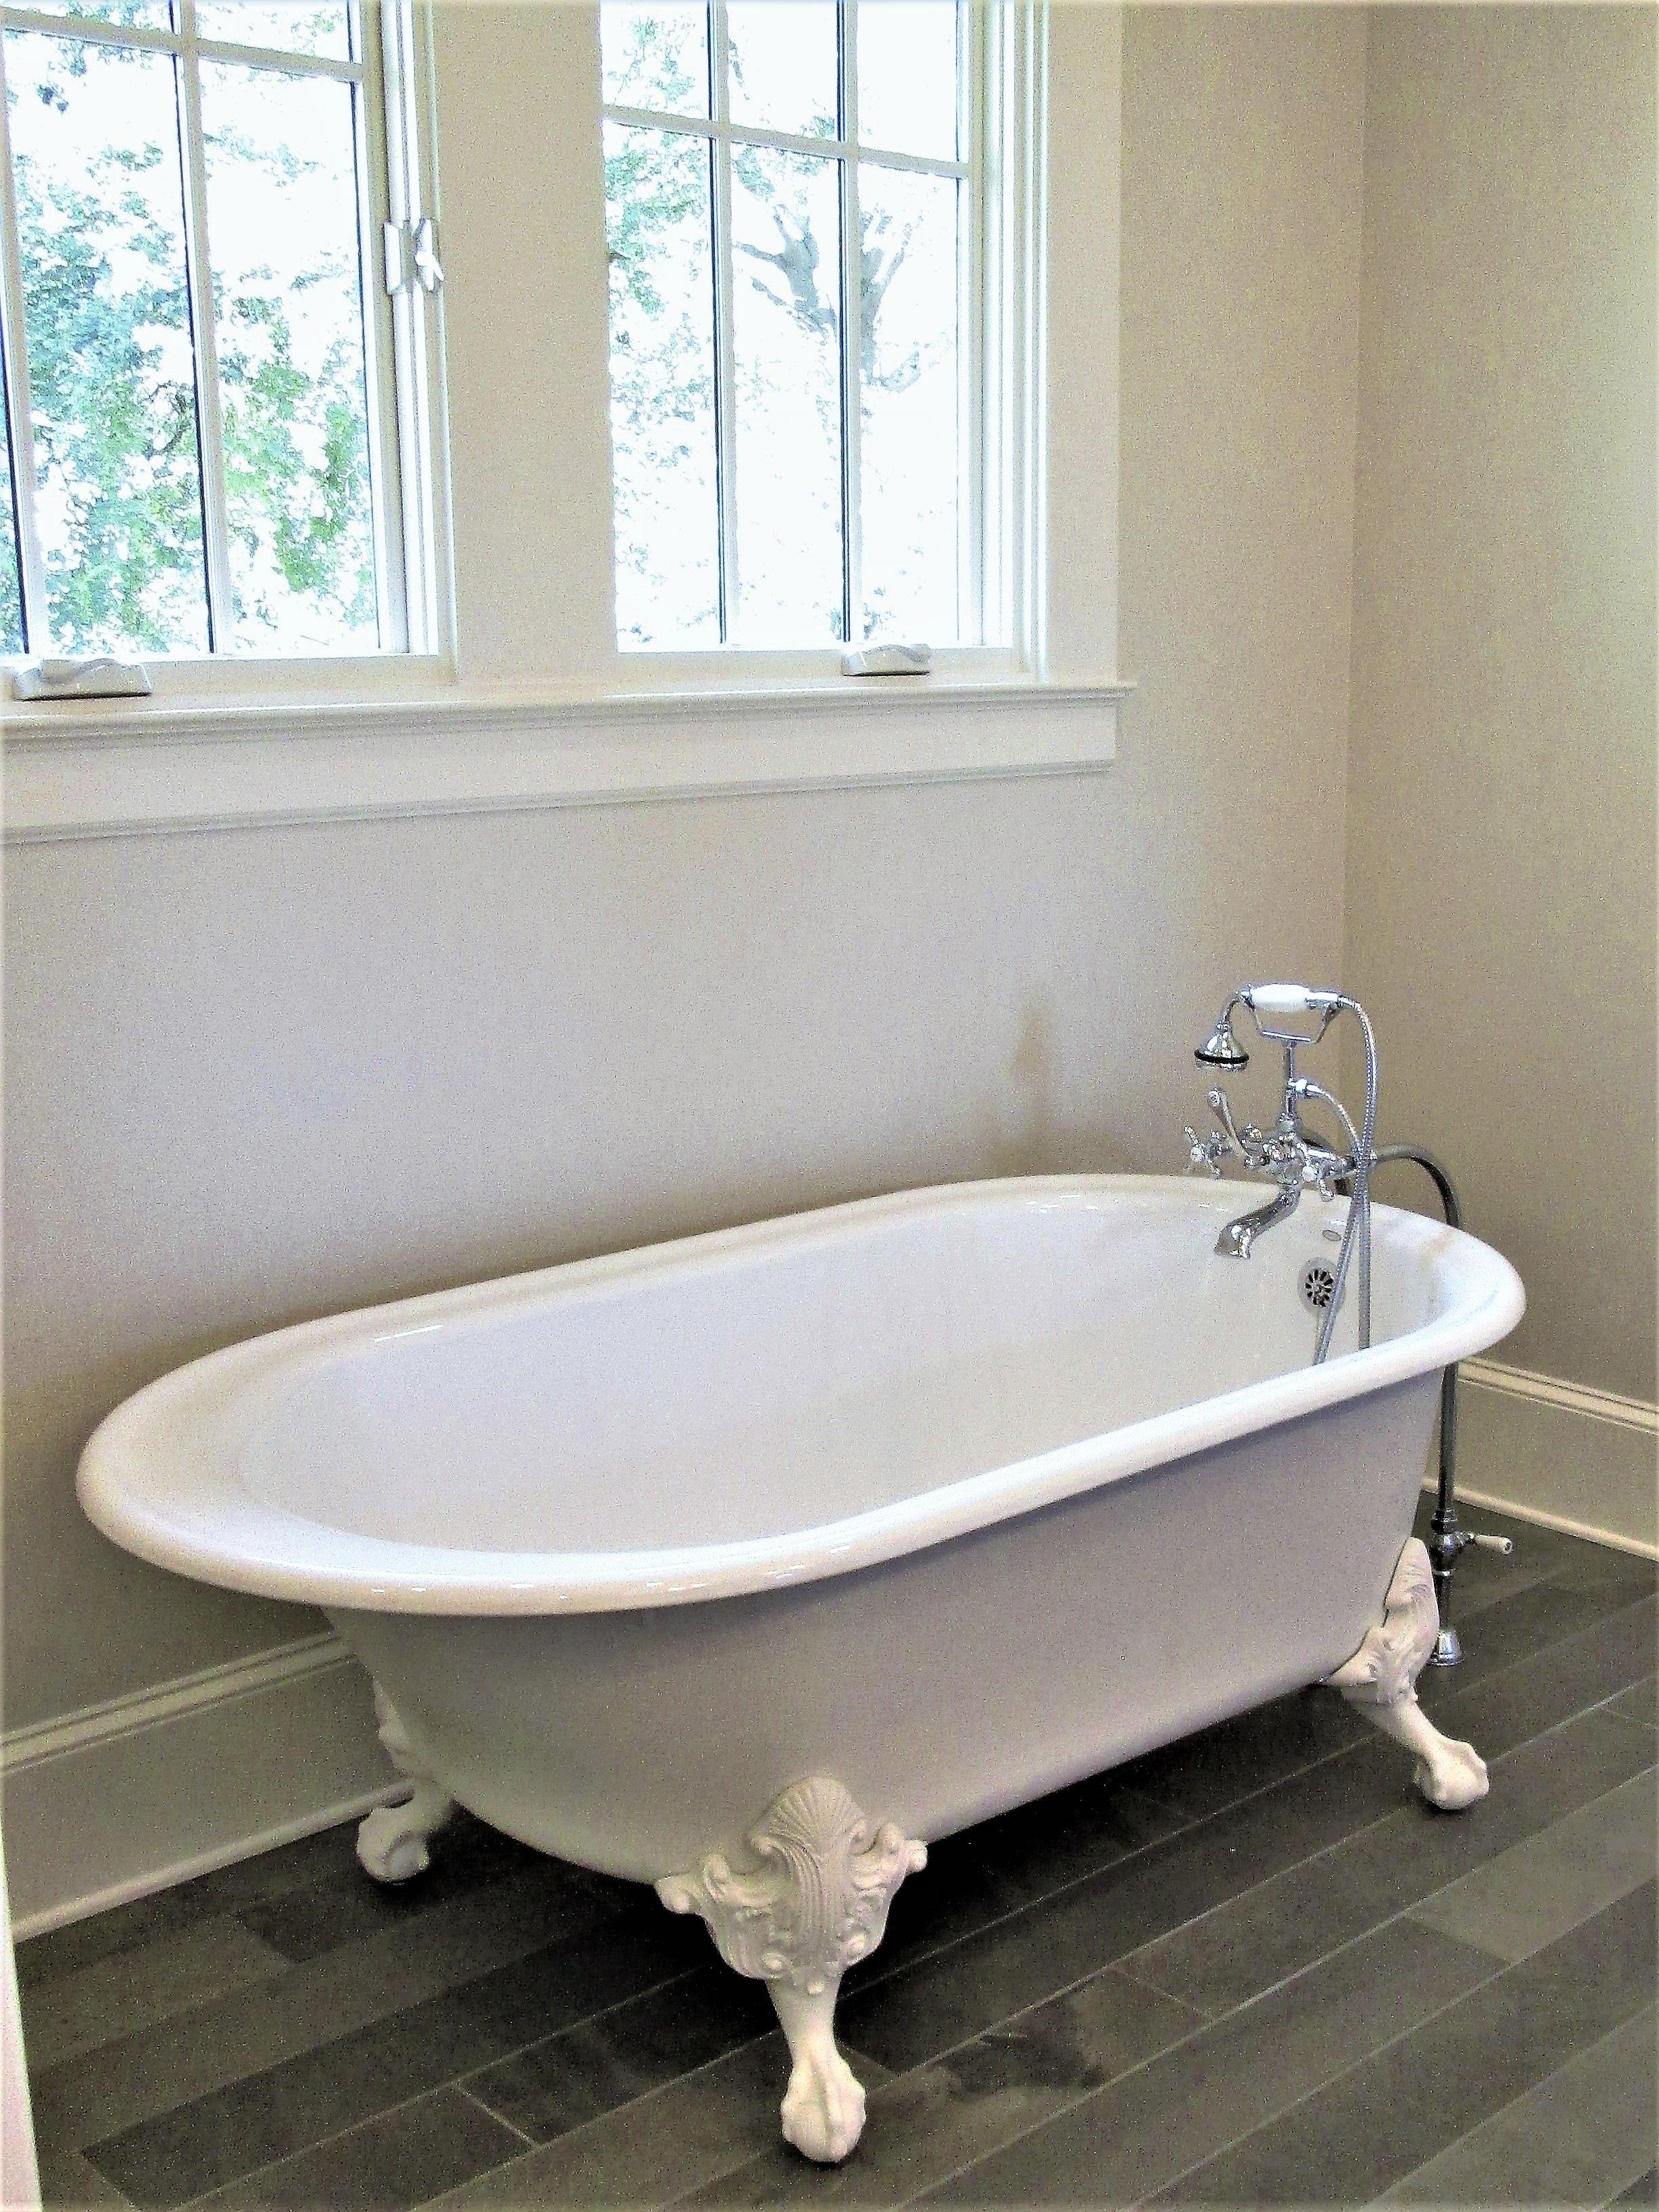 bathroom bathtubs bathtub underscore small shower faucets kohler whirlpool tub replacement bath parts and faucet vanity